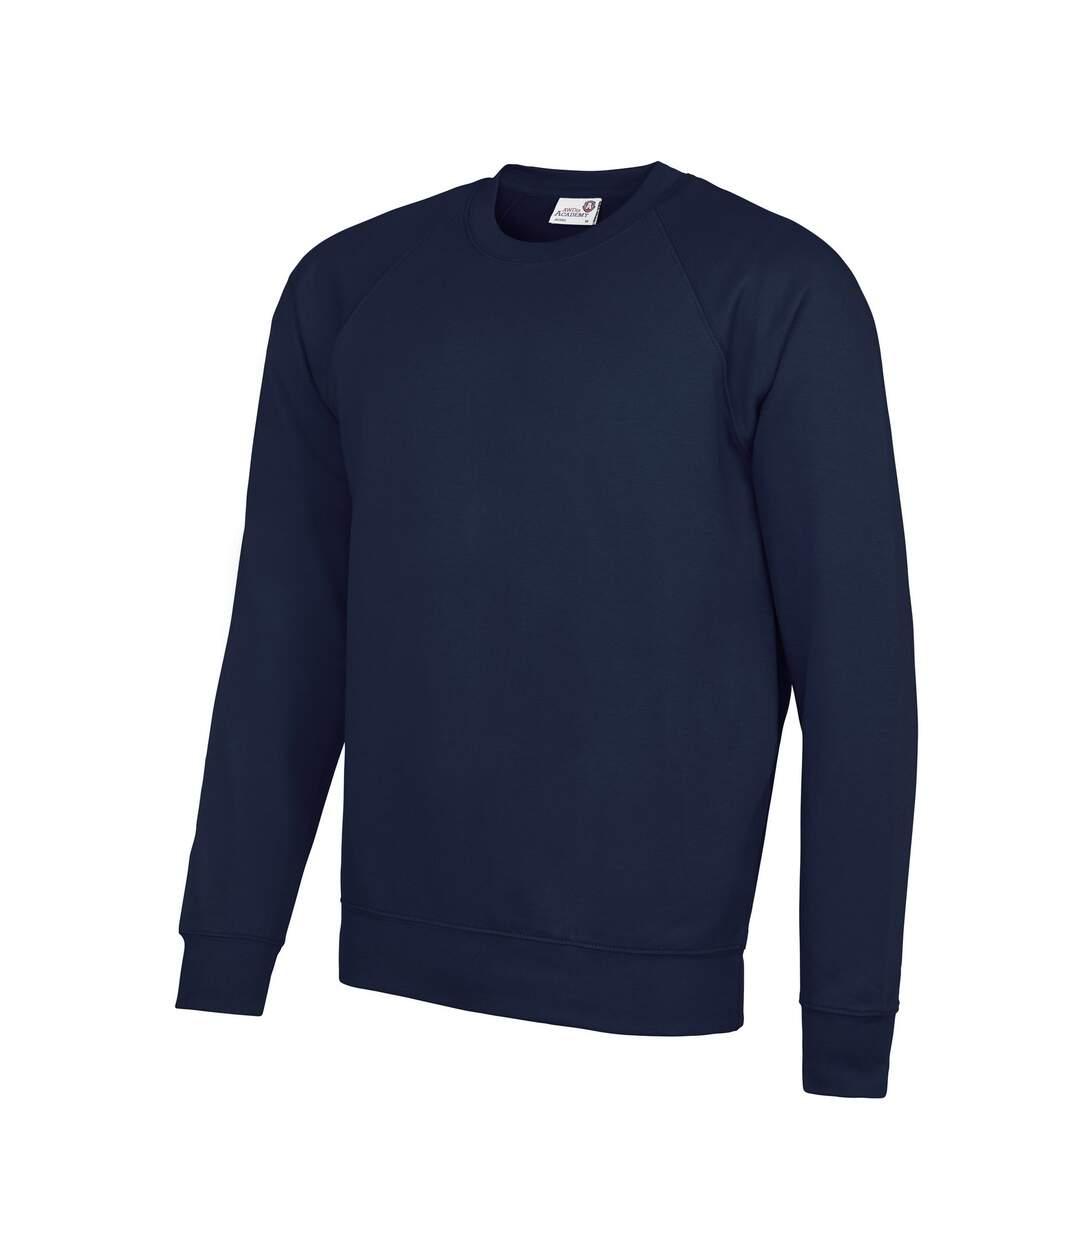 AWDis Academy Mens Crew Neck Raglan Sweatshirt (Navy) - UTRW3916